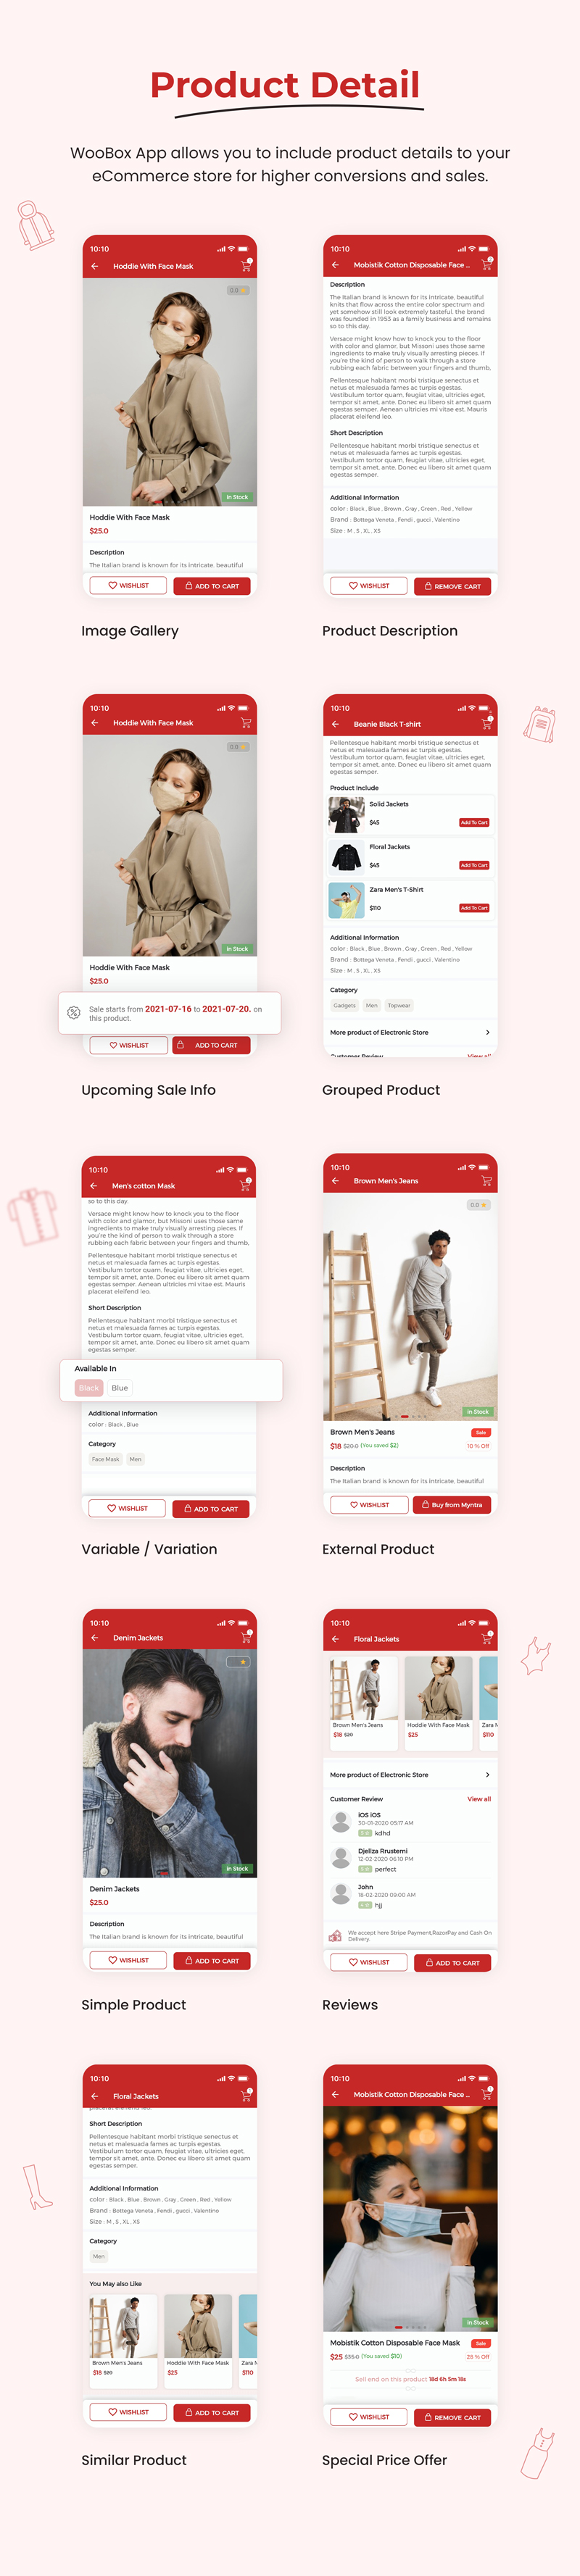 1 woocommerce flutter 2.0 e-commerce full mobile app All New WooBox 2.0 2 Product detail